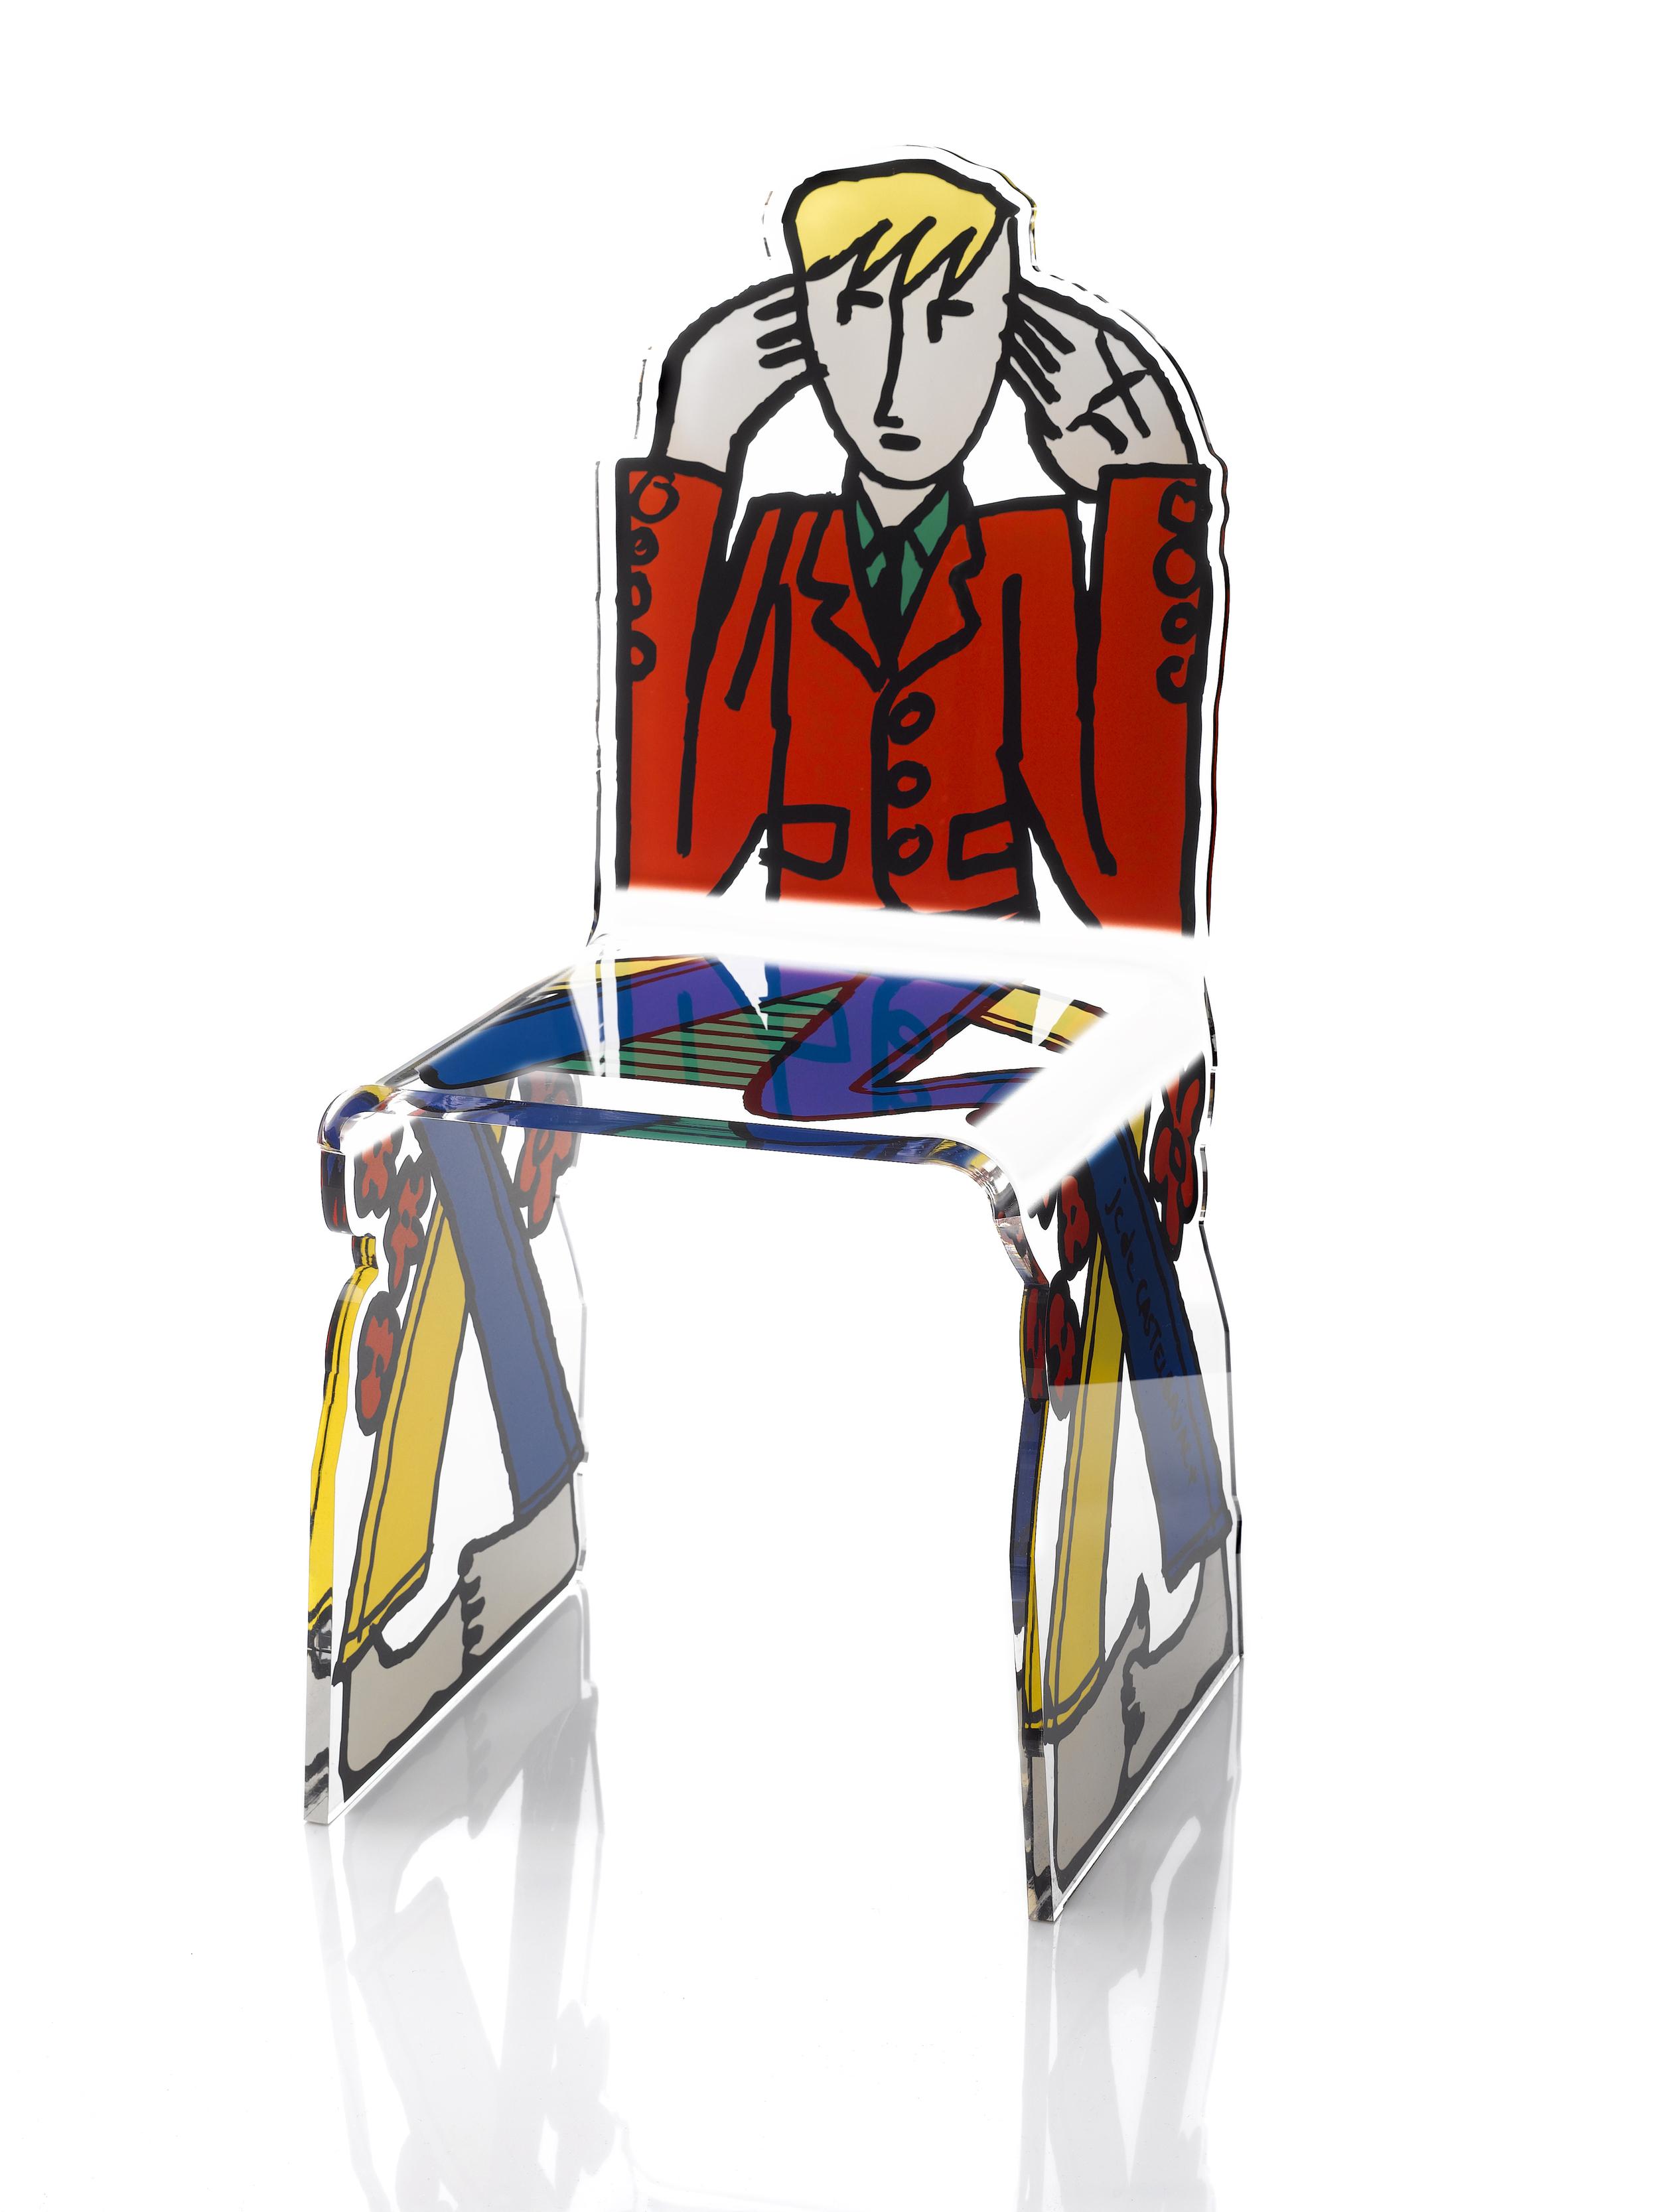 Chaise JCDC Homme.jpg